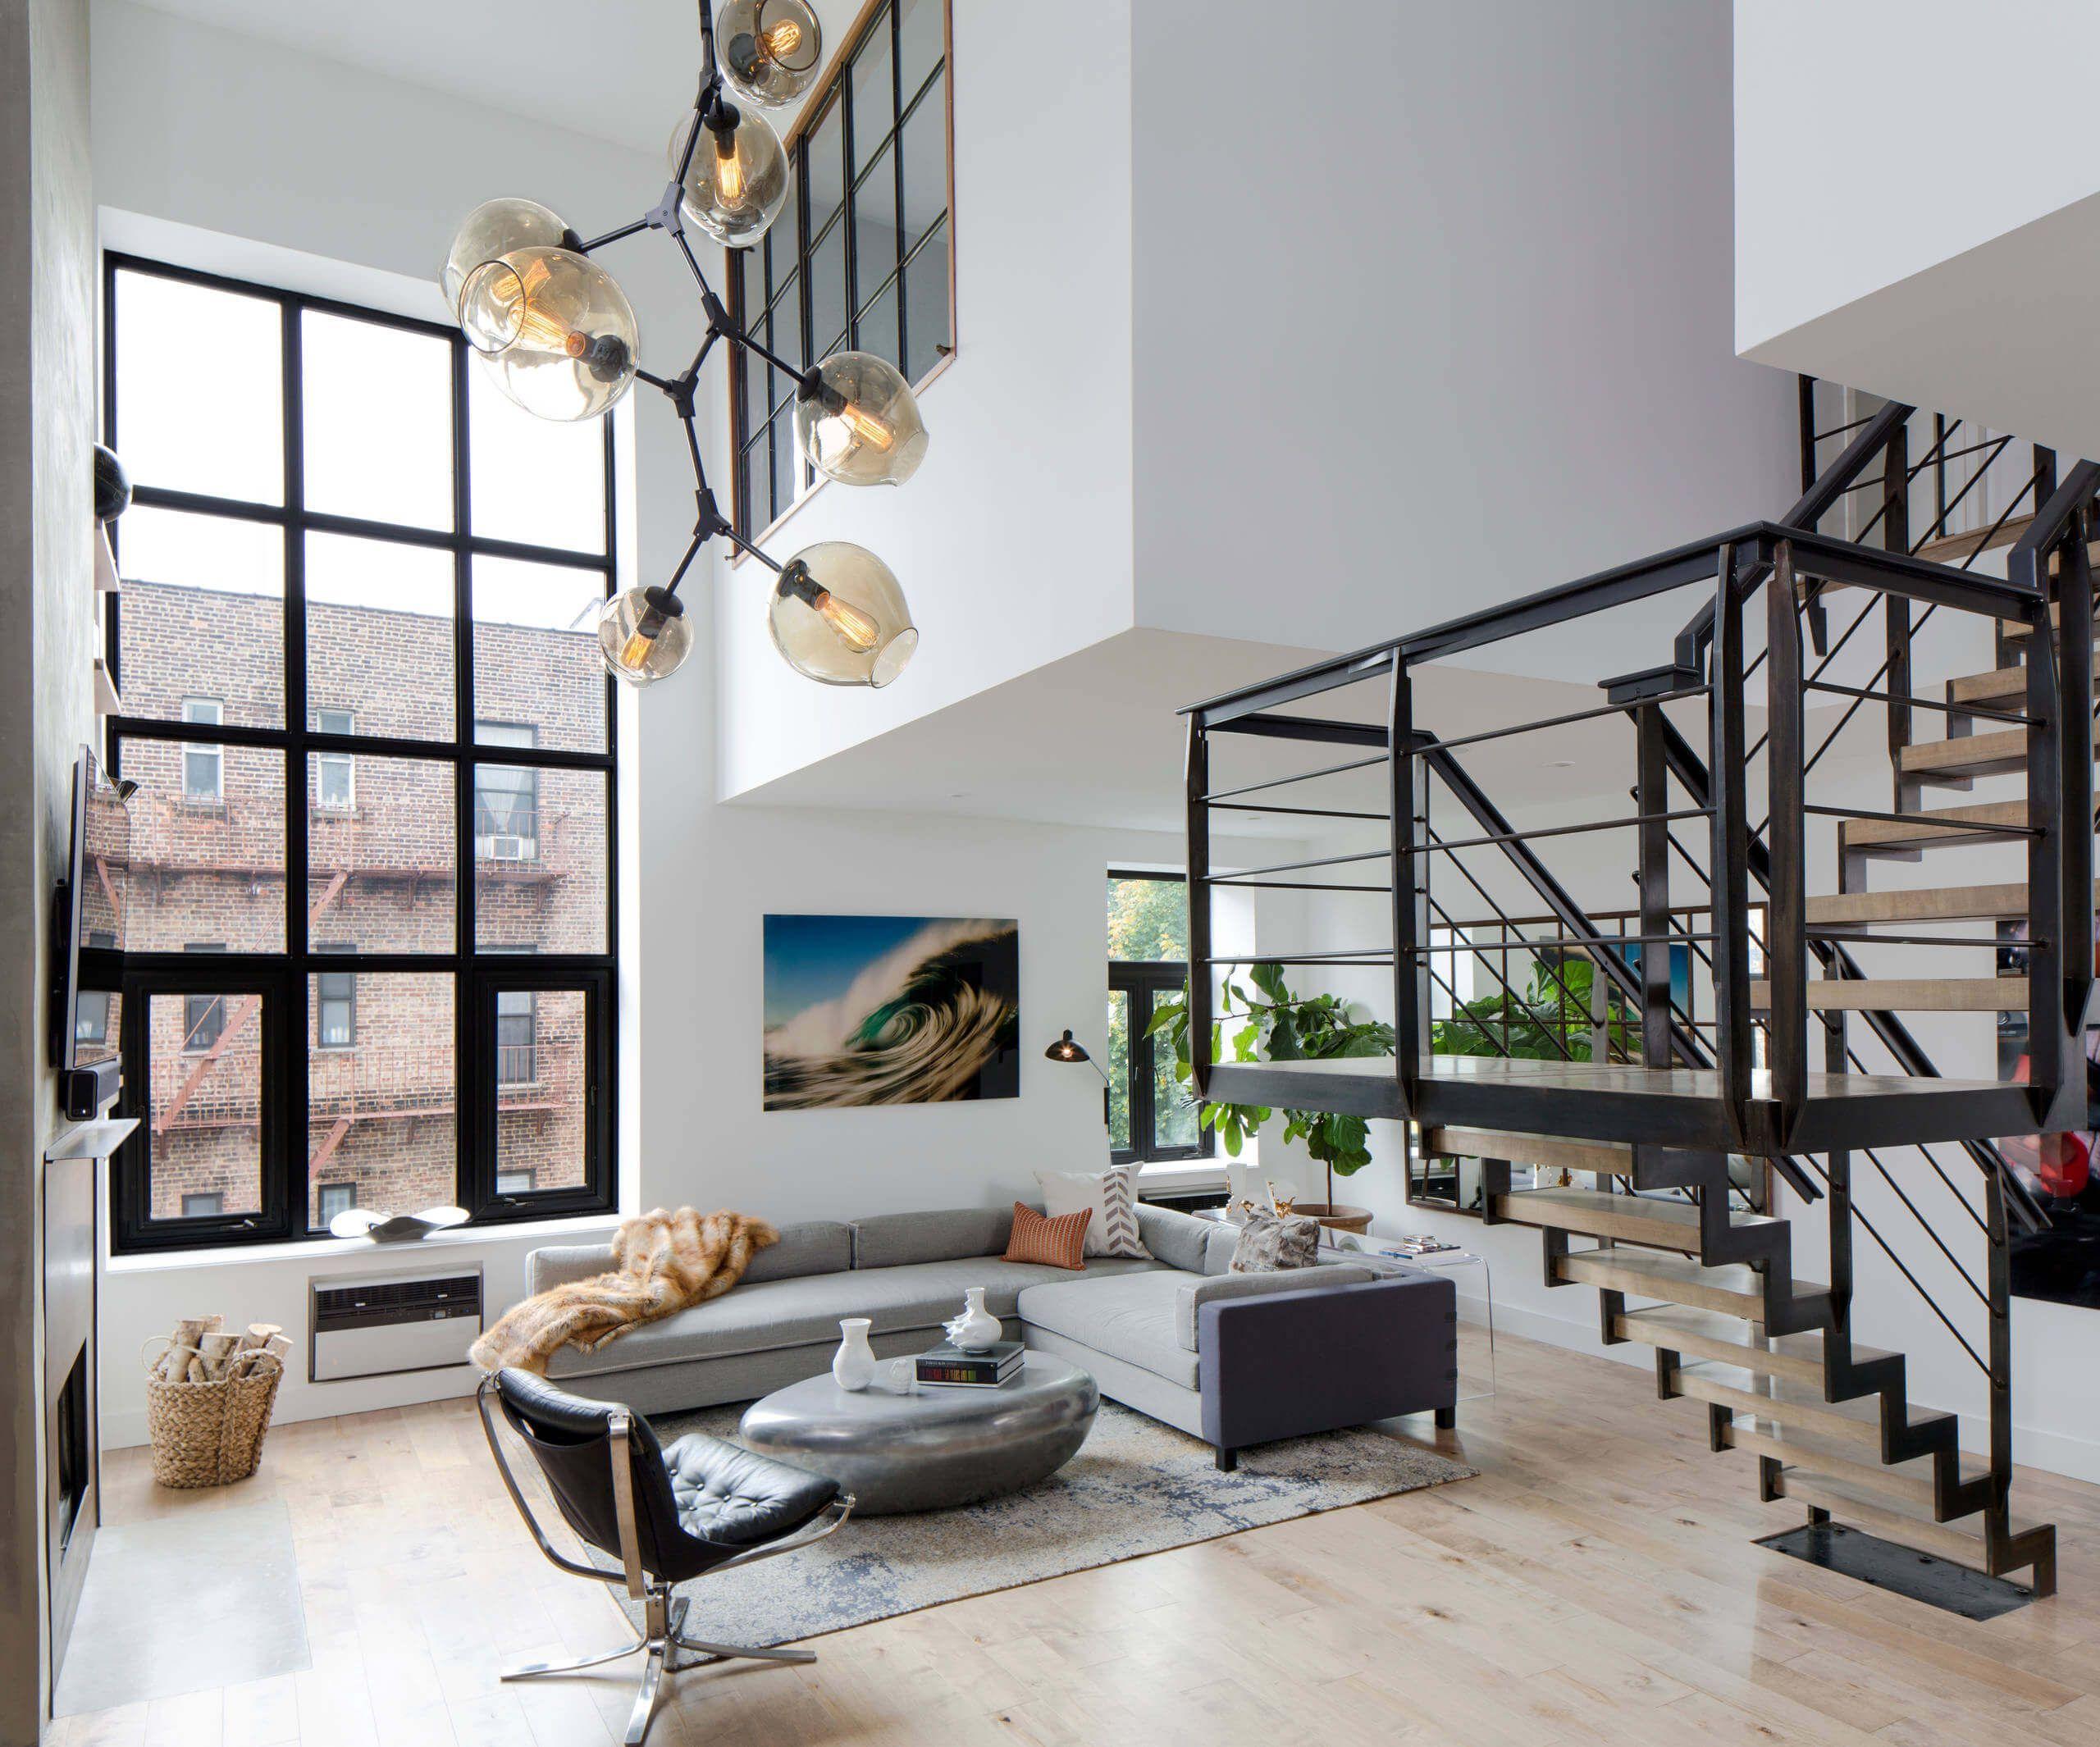 Soho duplex by d cor aid interiores pinterest for Arquitectura de interiores a distancia